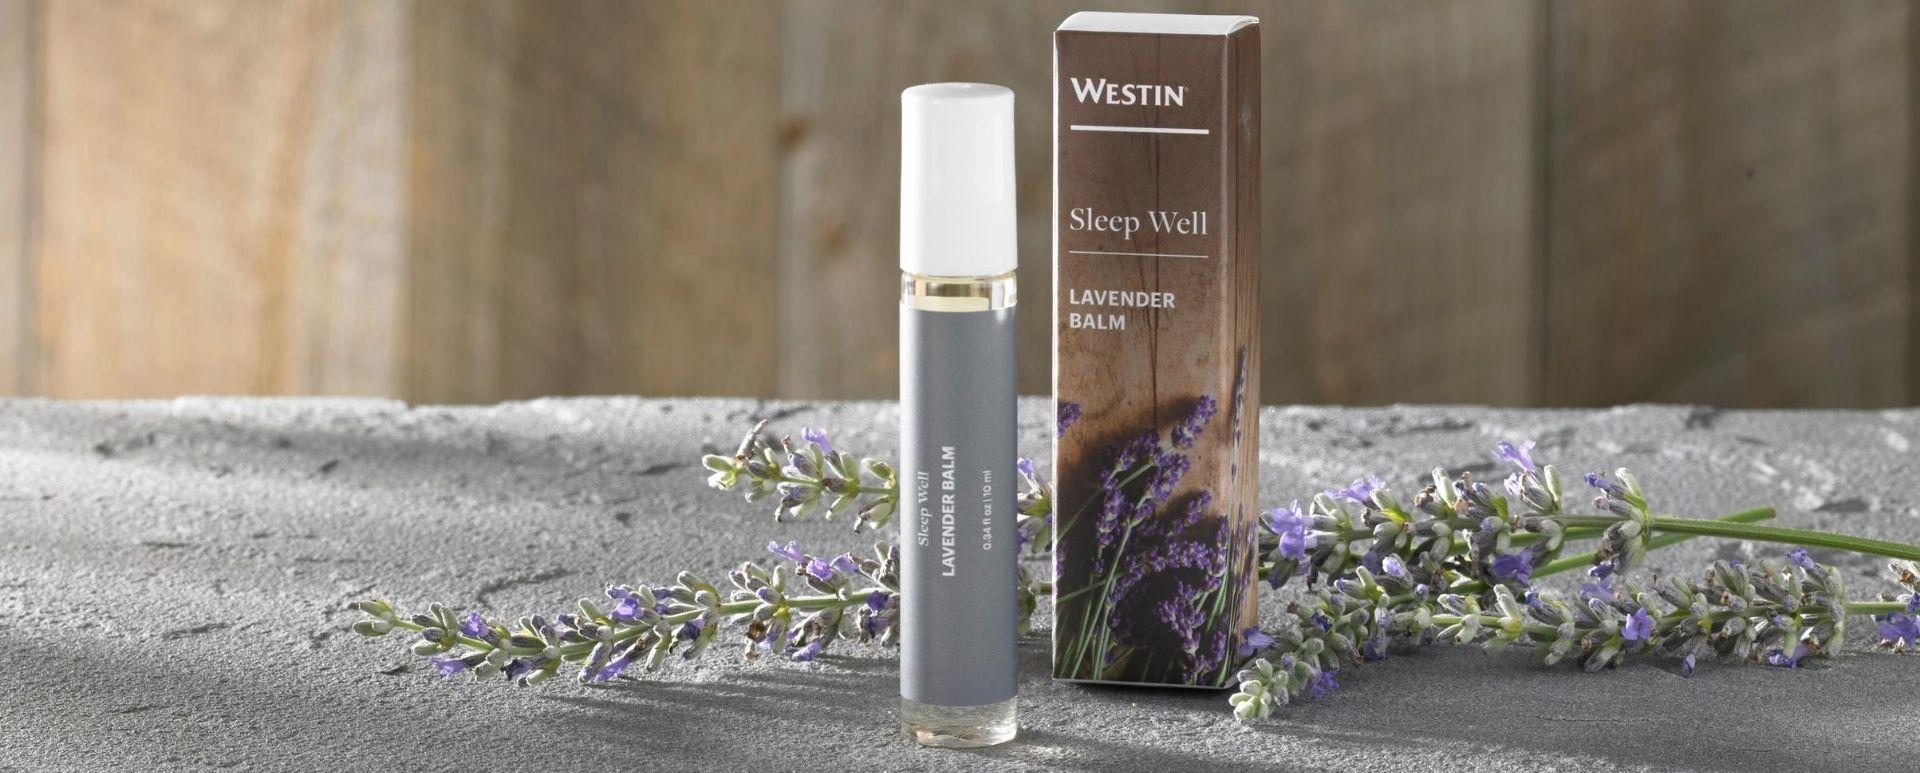 Westin lavendar balm